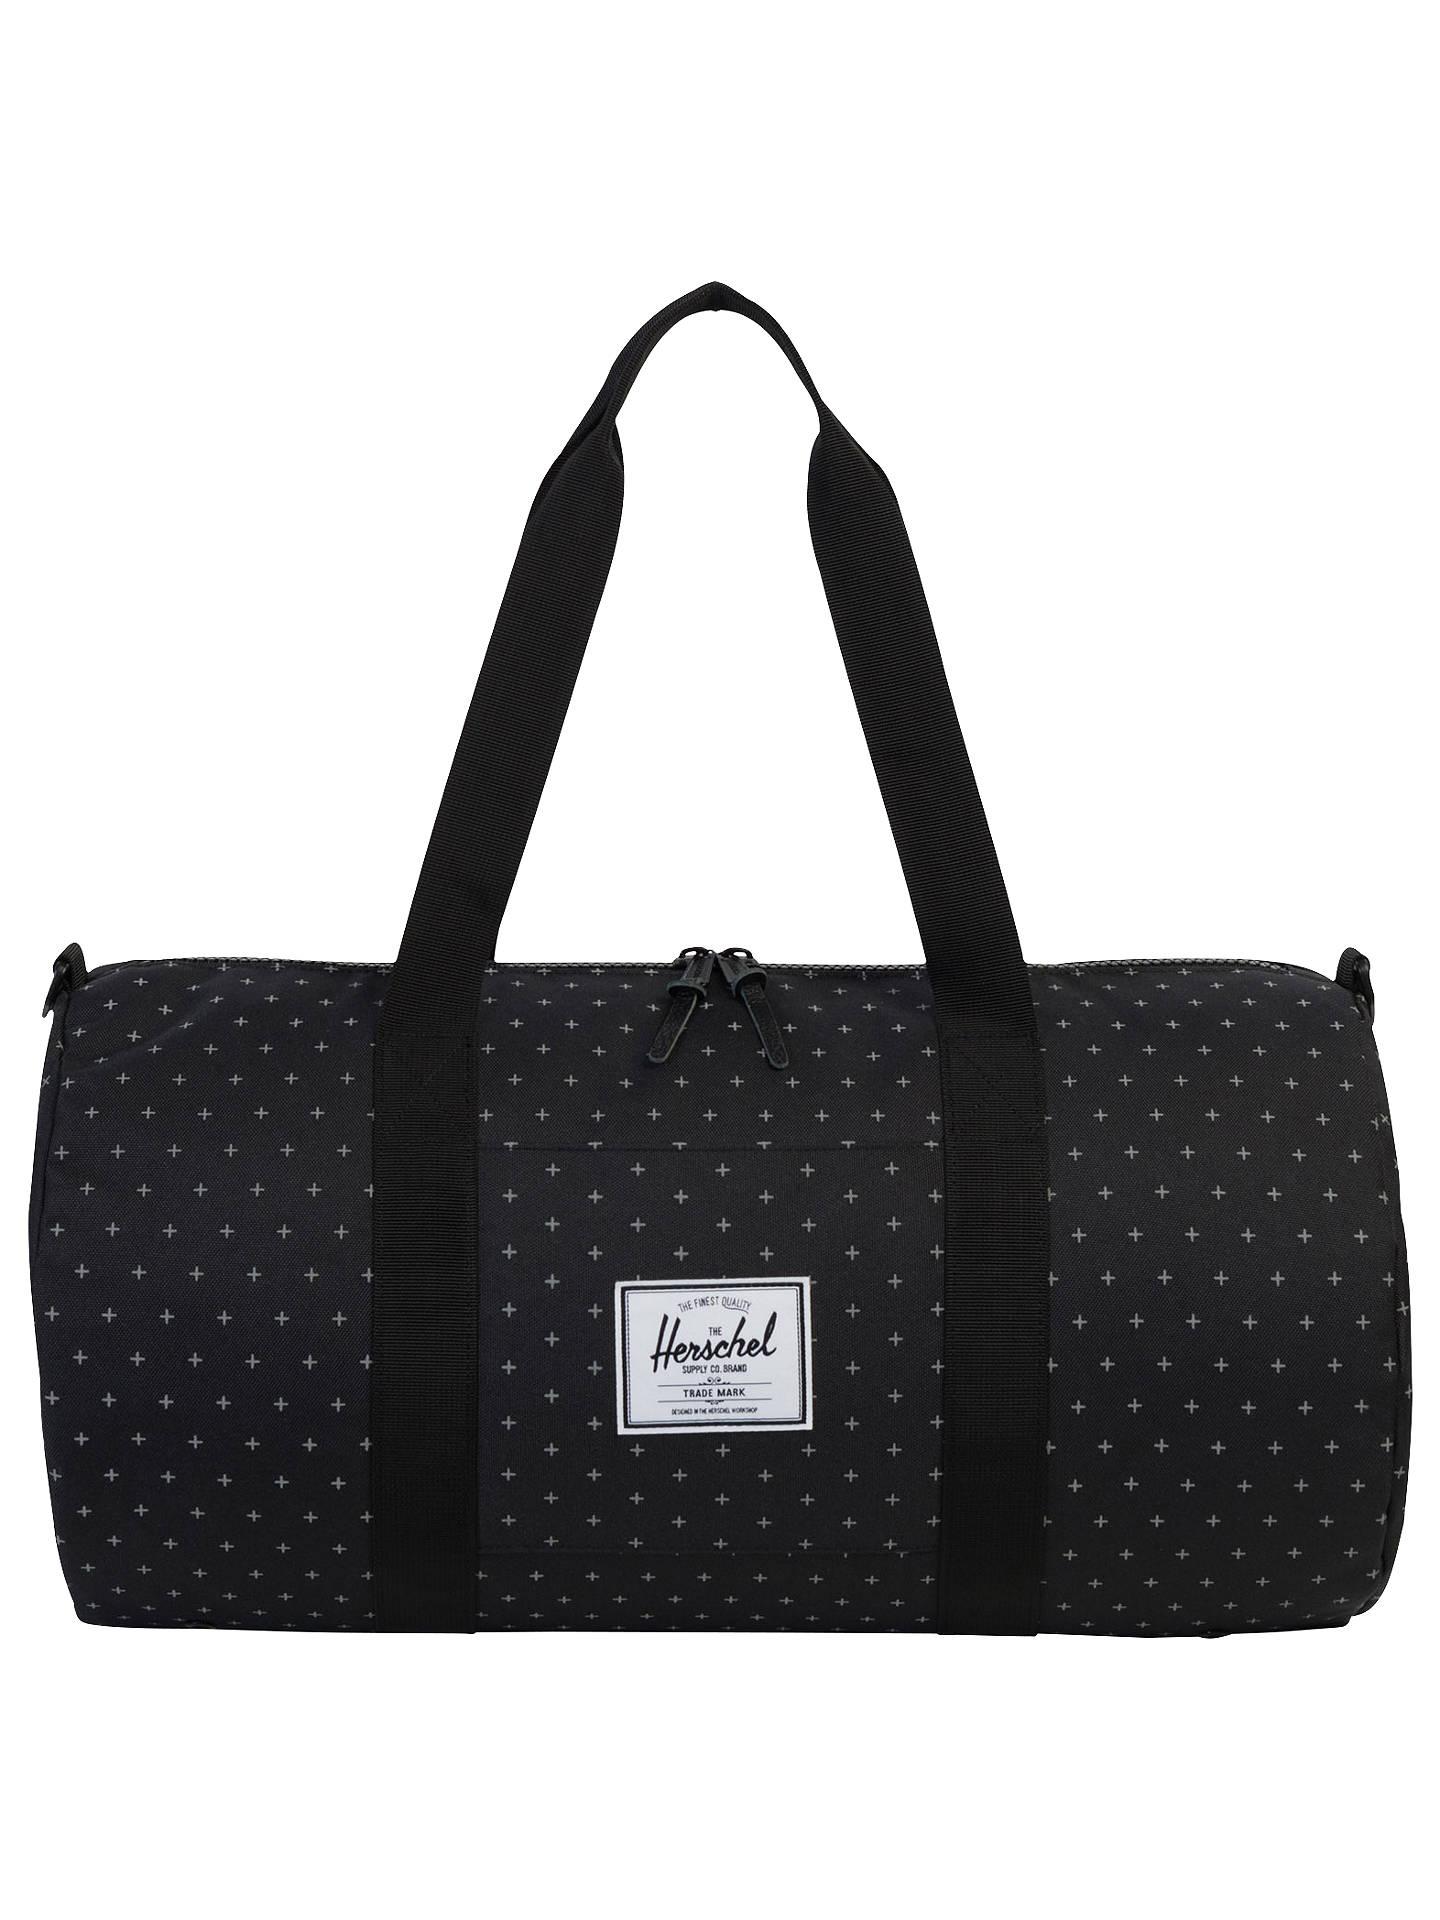 2f8166b4b461 Buy Herschel Supply Co. Sutton Duffle Bag